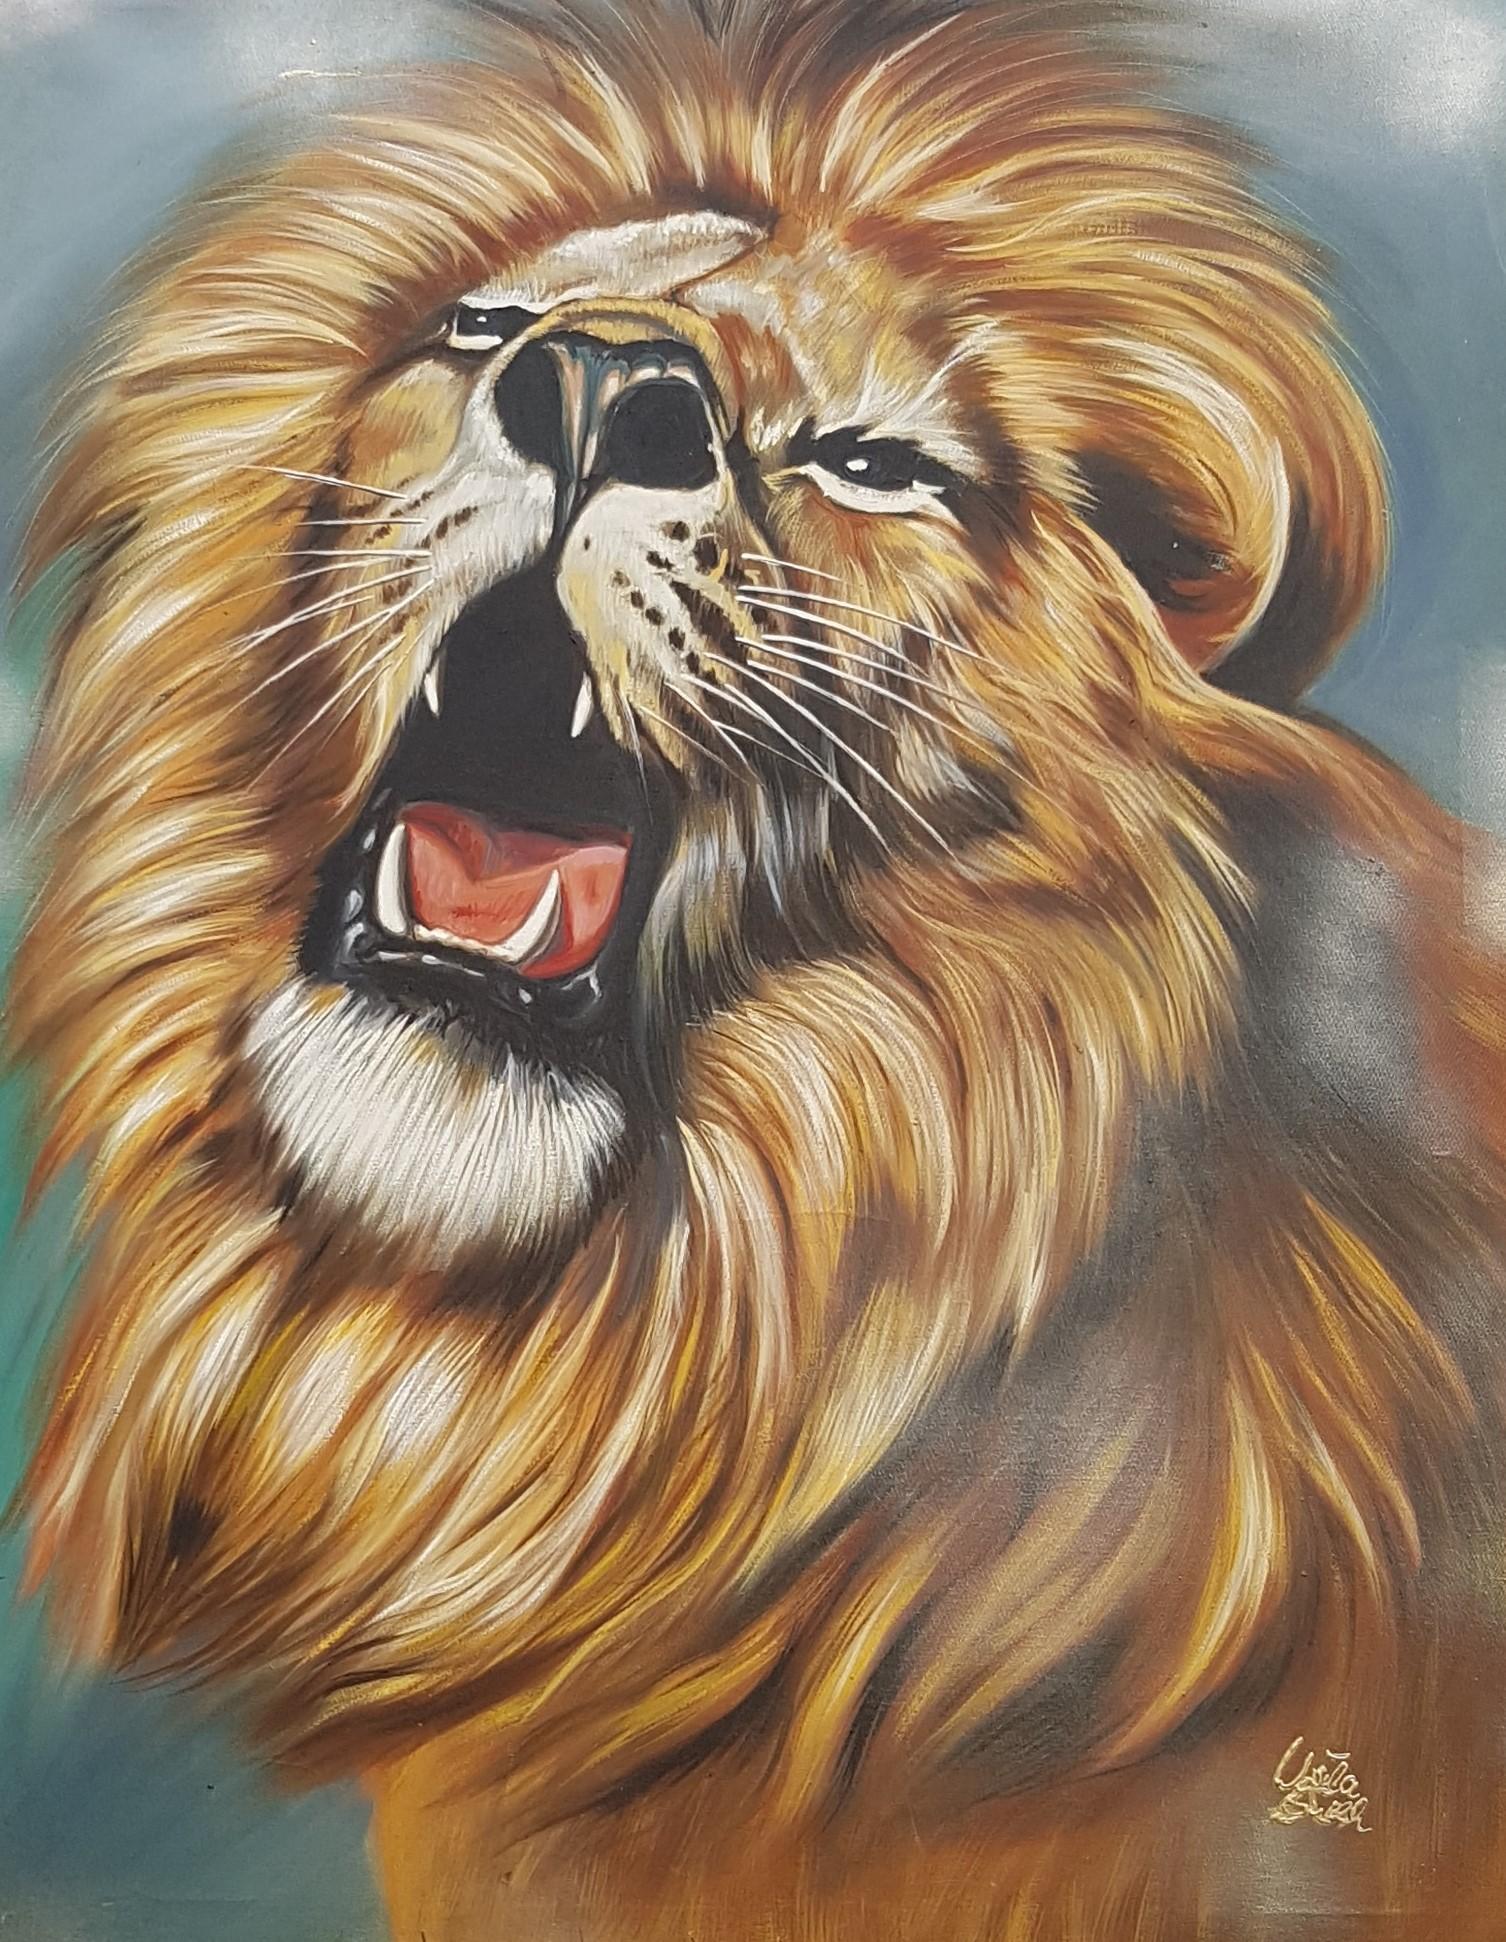 I am the king  (Technik: Ölmalerei auf Leinwand, 89,5 X 1,19 X 2 cm)